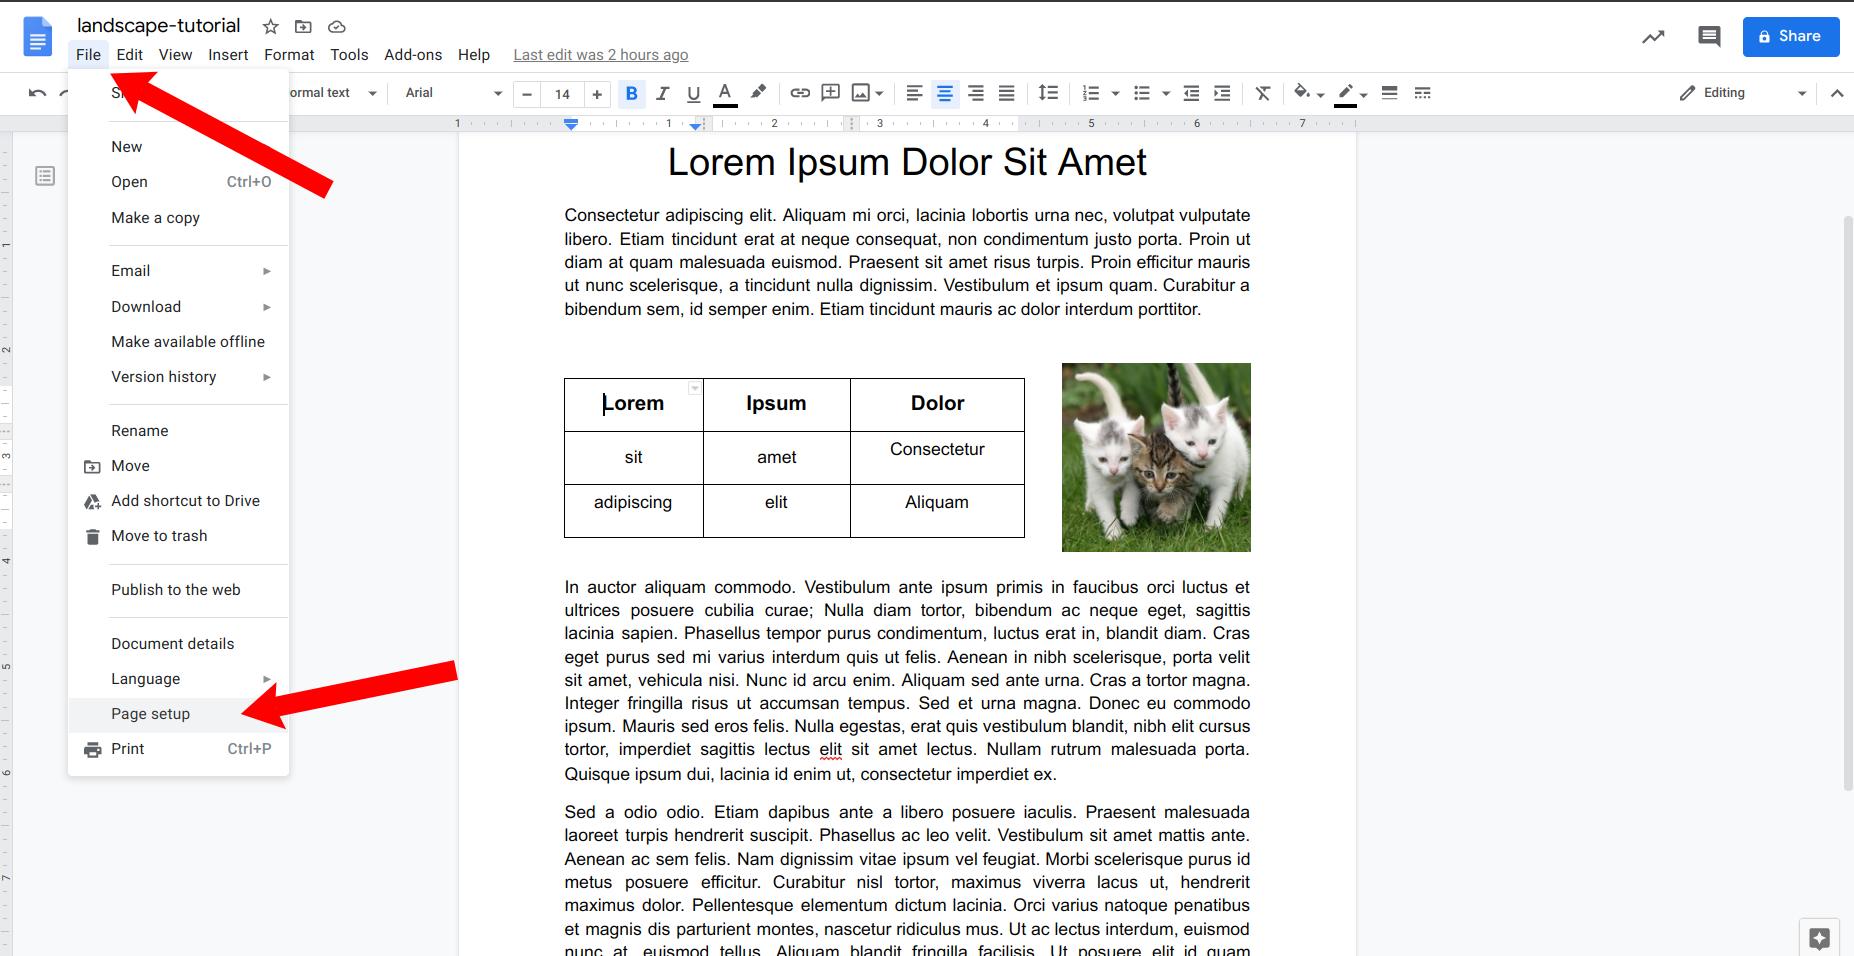 How To Make Google Docs Landscape Quick Guide